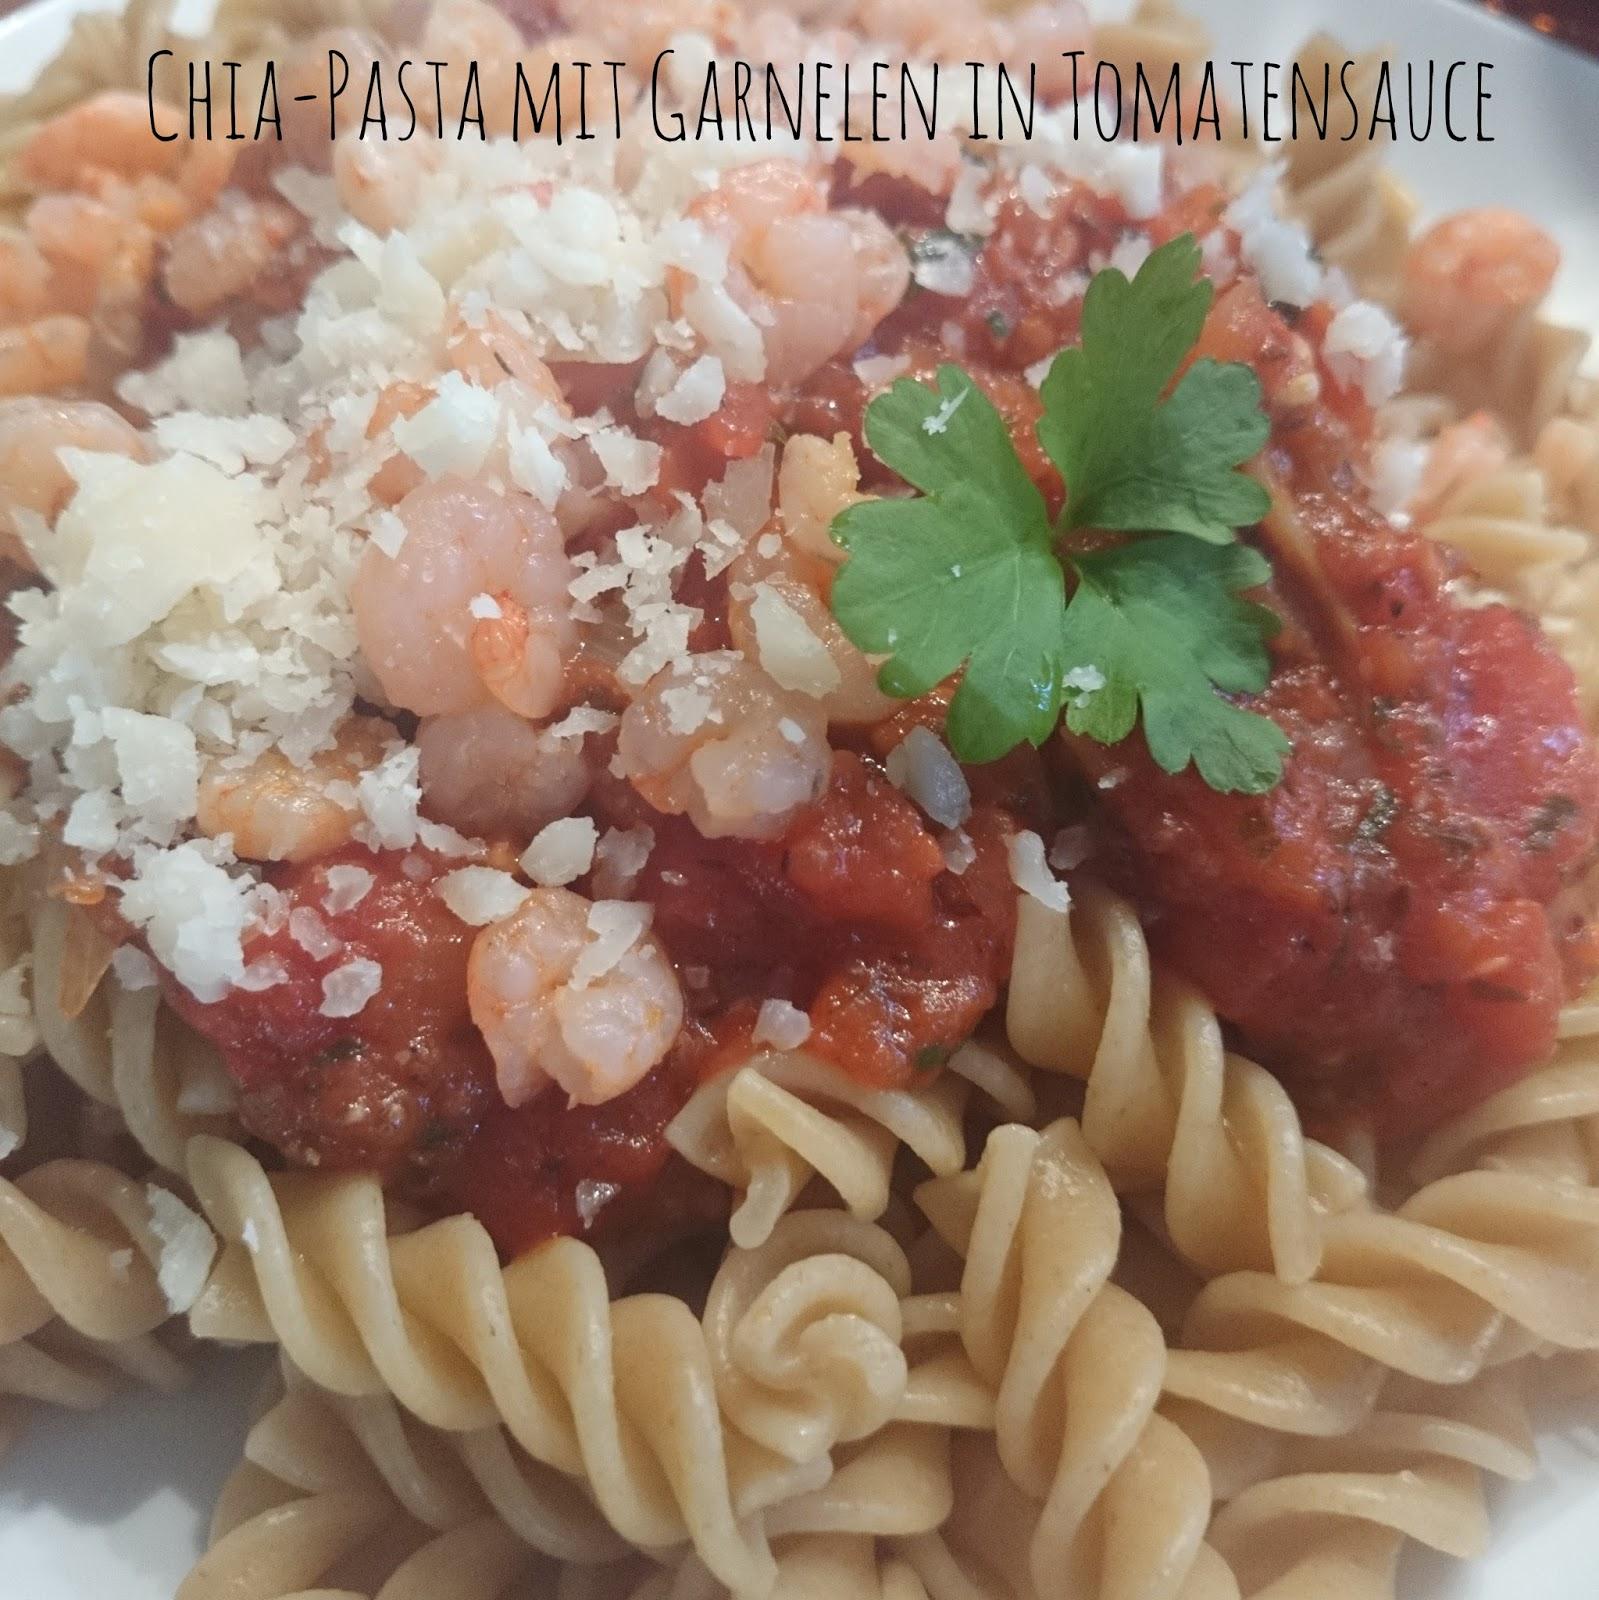 lucciola food chia pasta mit garnelen in tomatensauce. Black Bedroom Furniture Sets. Home Design Ideas